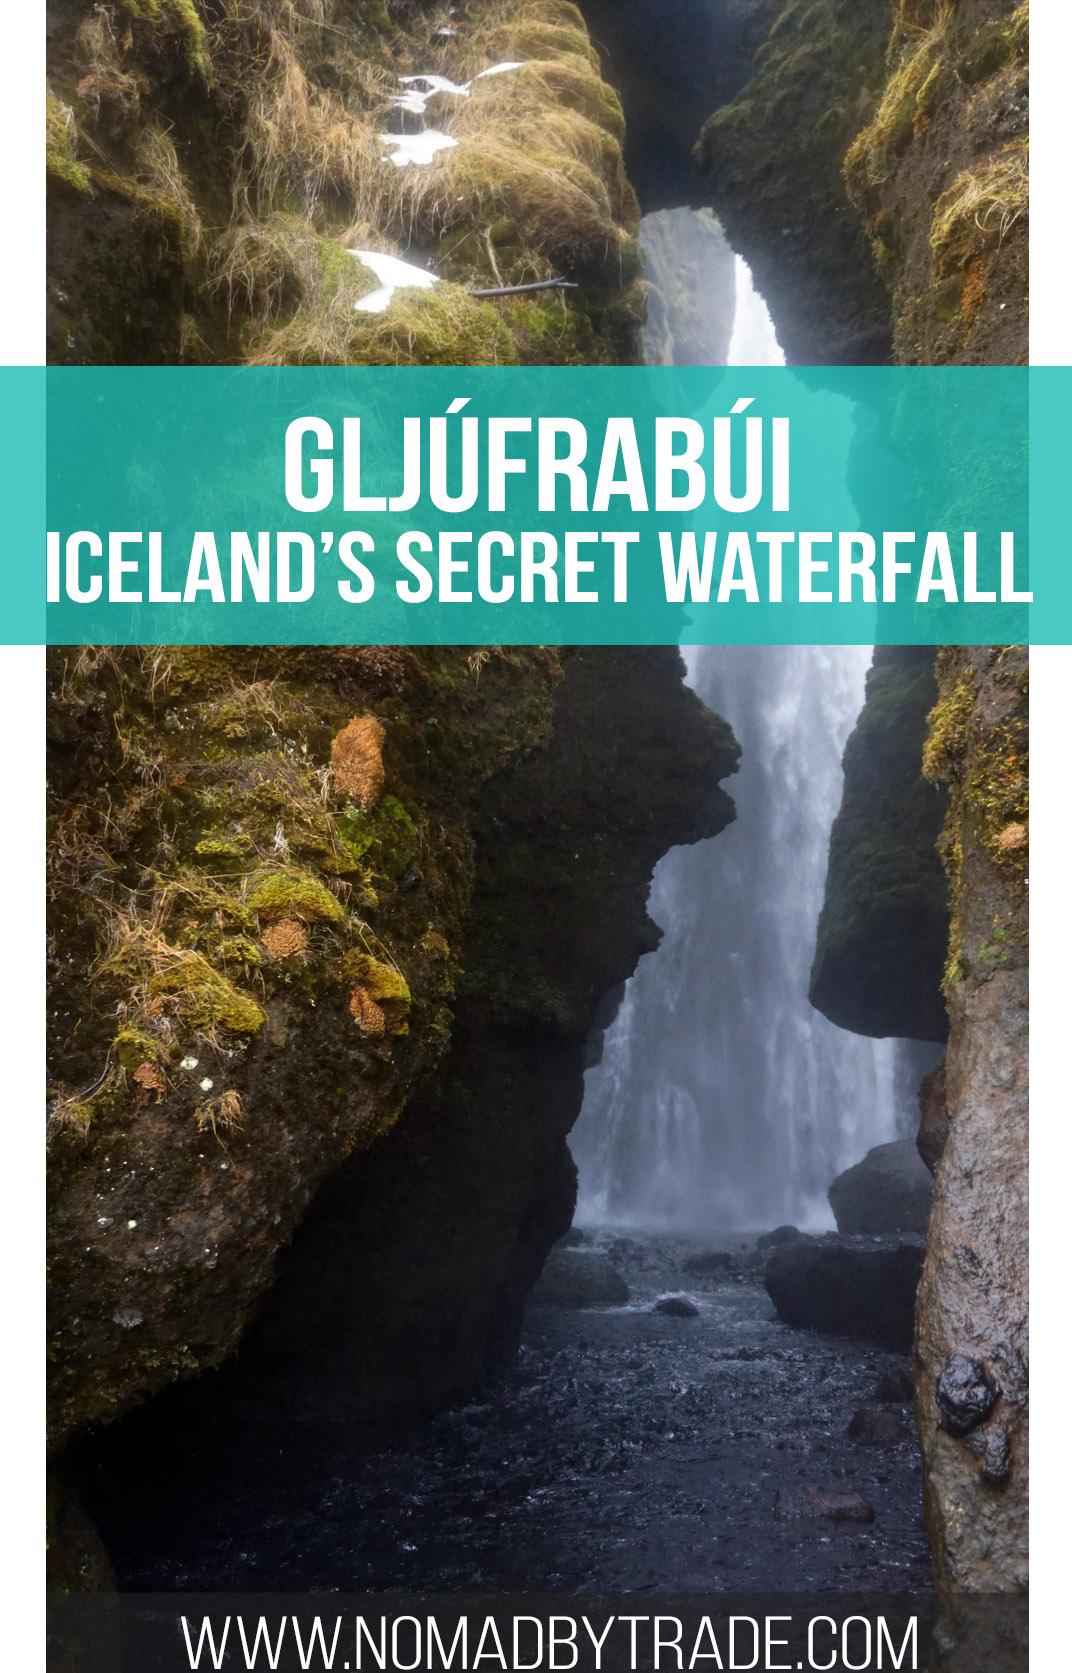 Discover Gljúfrabúi, Iceland's hidden waterfall by wading through a stream or doing some light rock climbing